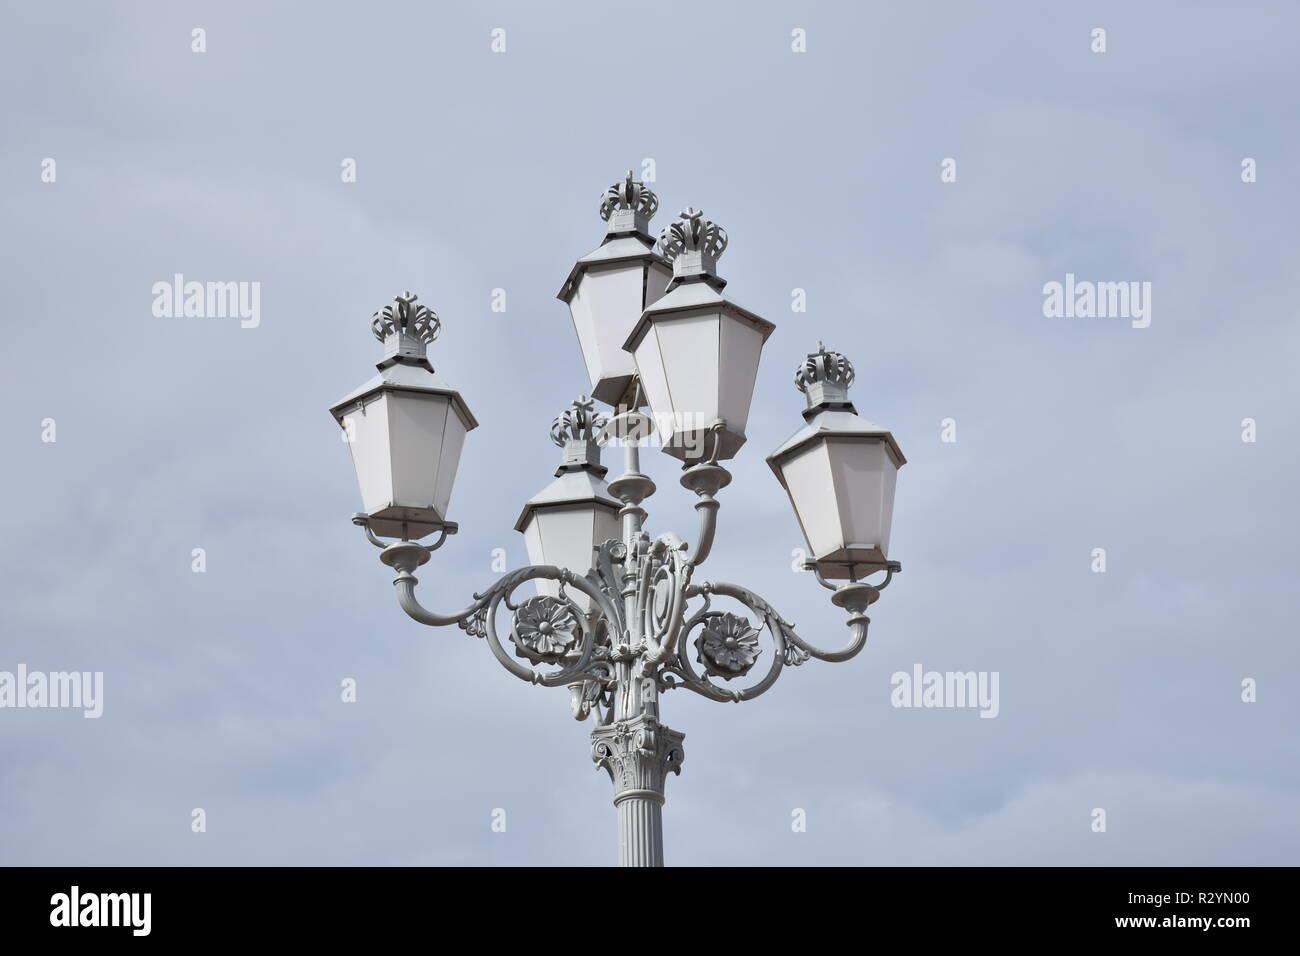 Norwegen, Oslo, Straßenlaterne, Kandelaver, historisch, Licht, Beleuchtung, Lampe, Schloss, Königliches Schloss, Park, Schlosspark, Tradition, traditi - Stock Image